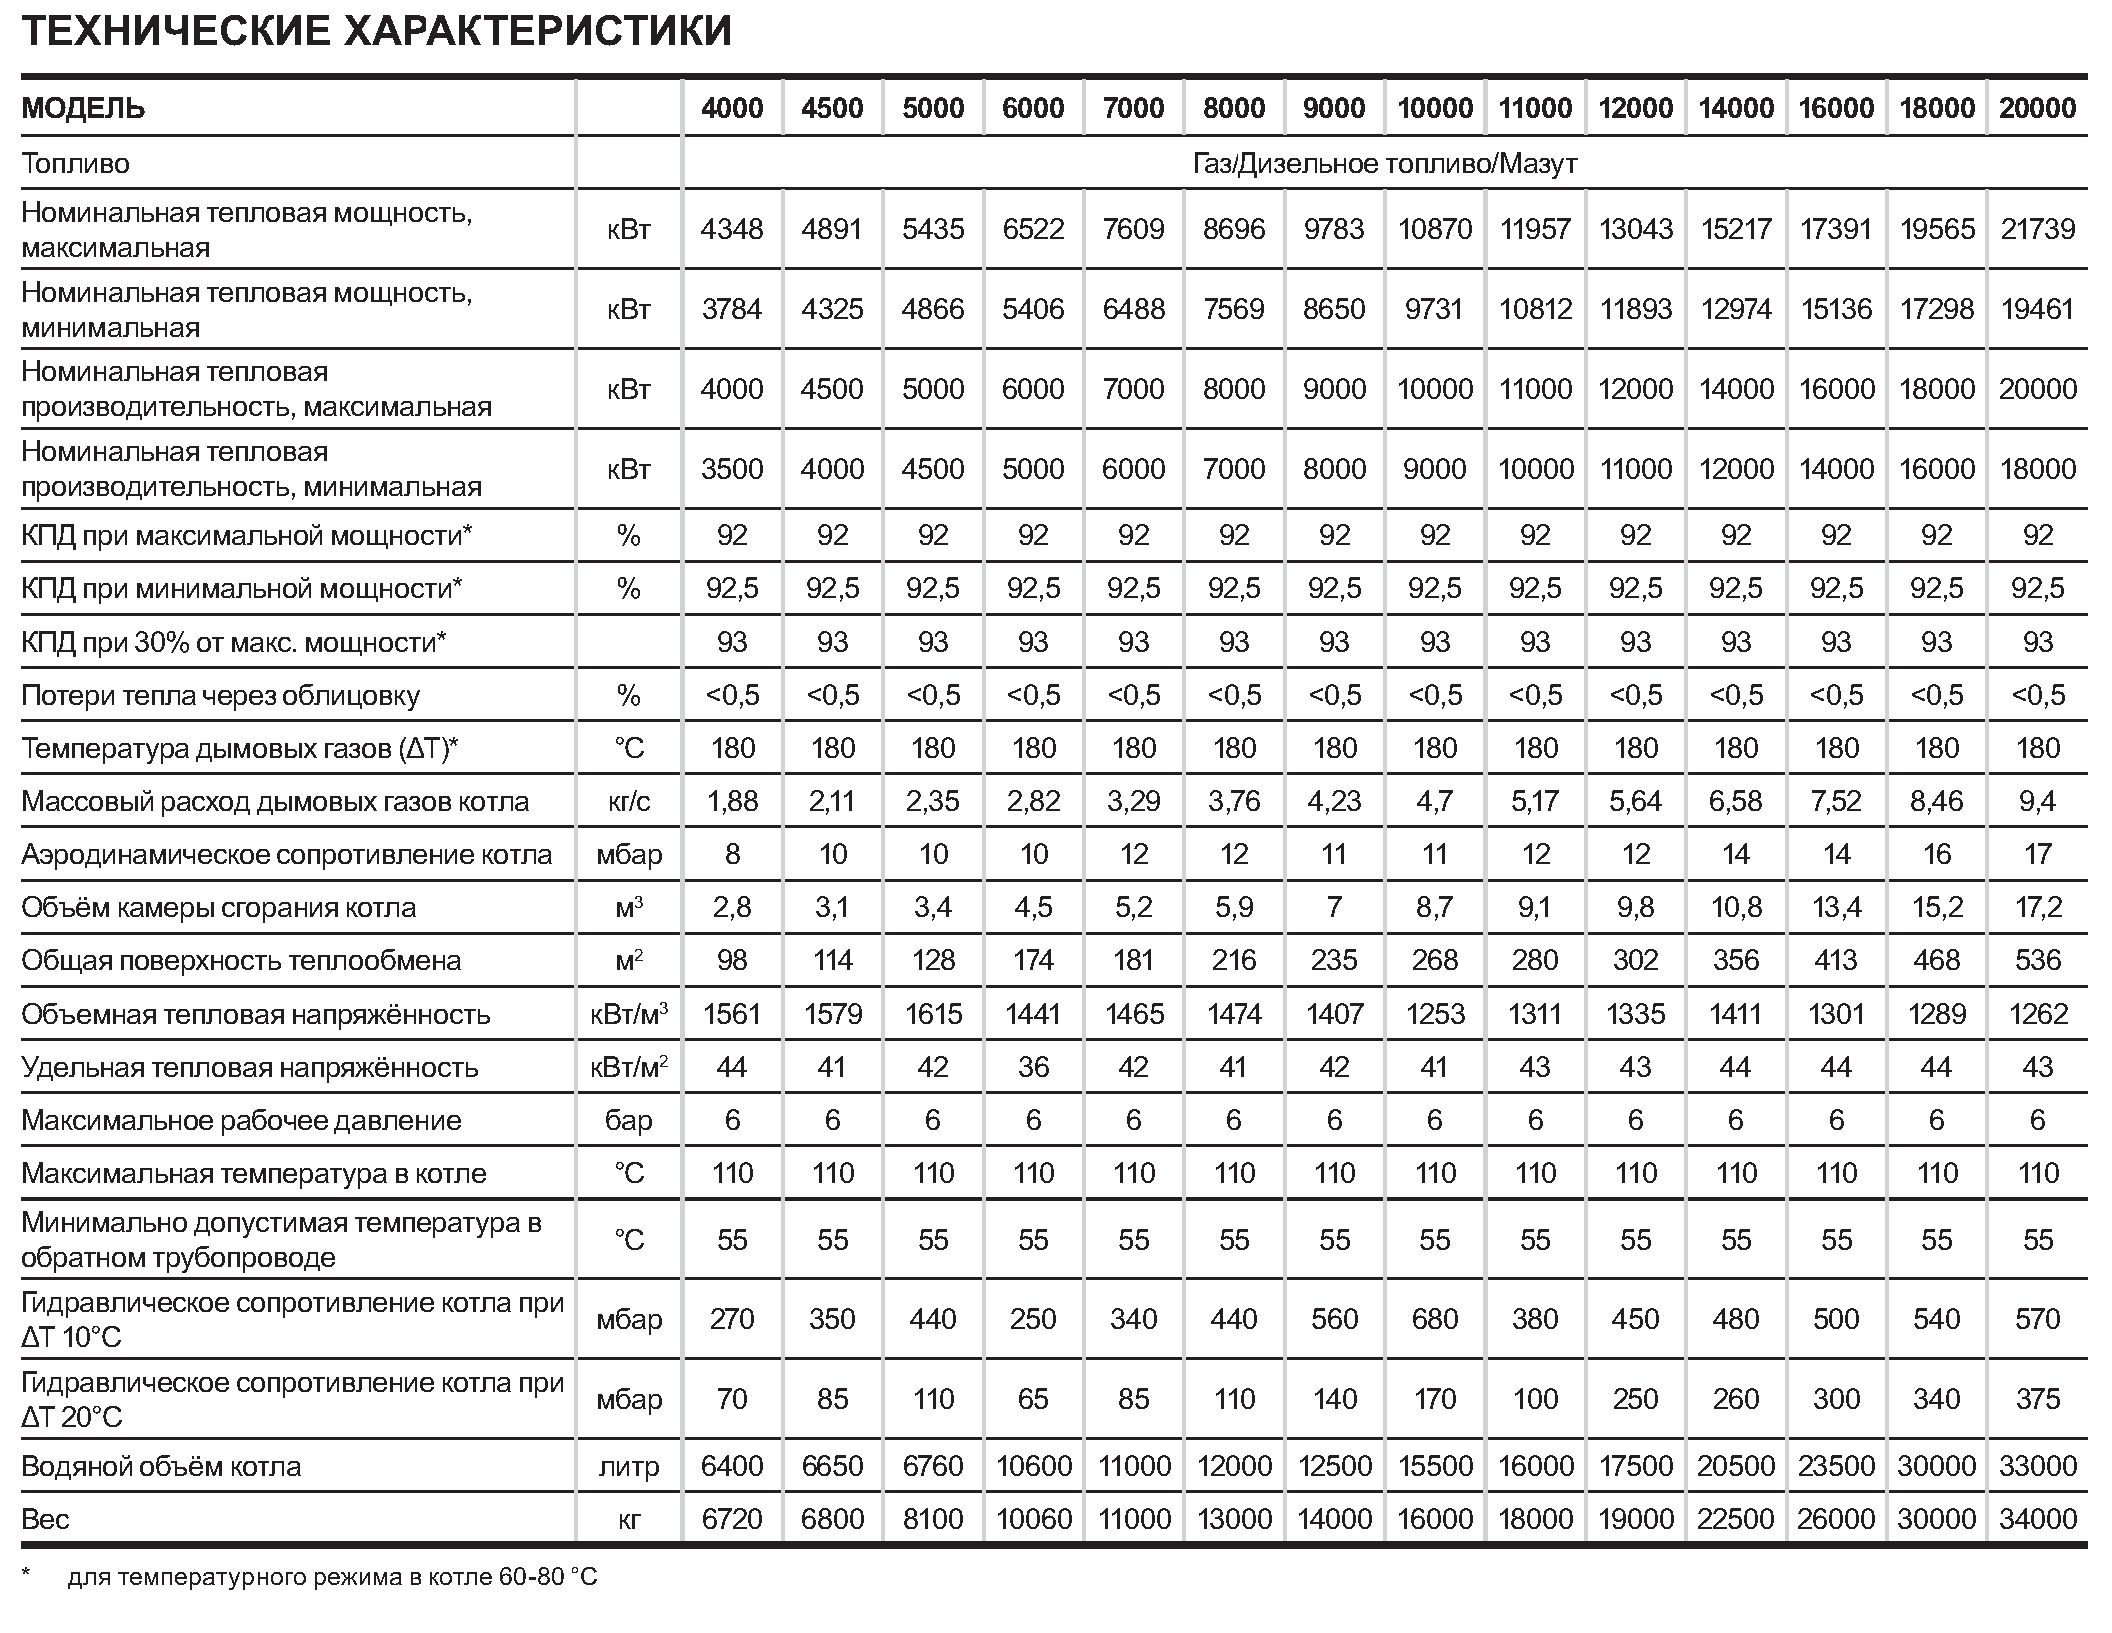 Таблица с техническими параметрами котлов RIELLO RTQ TK